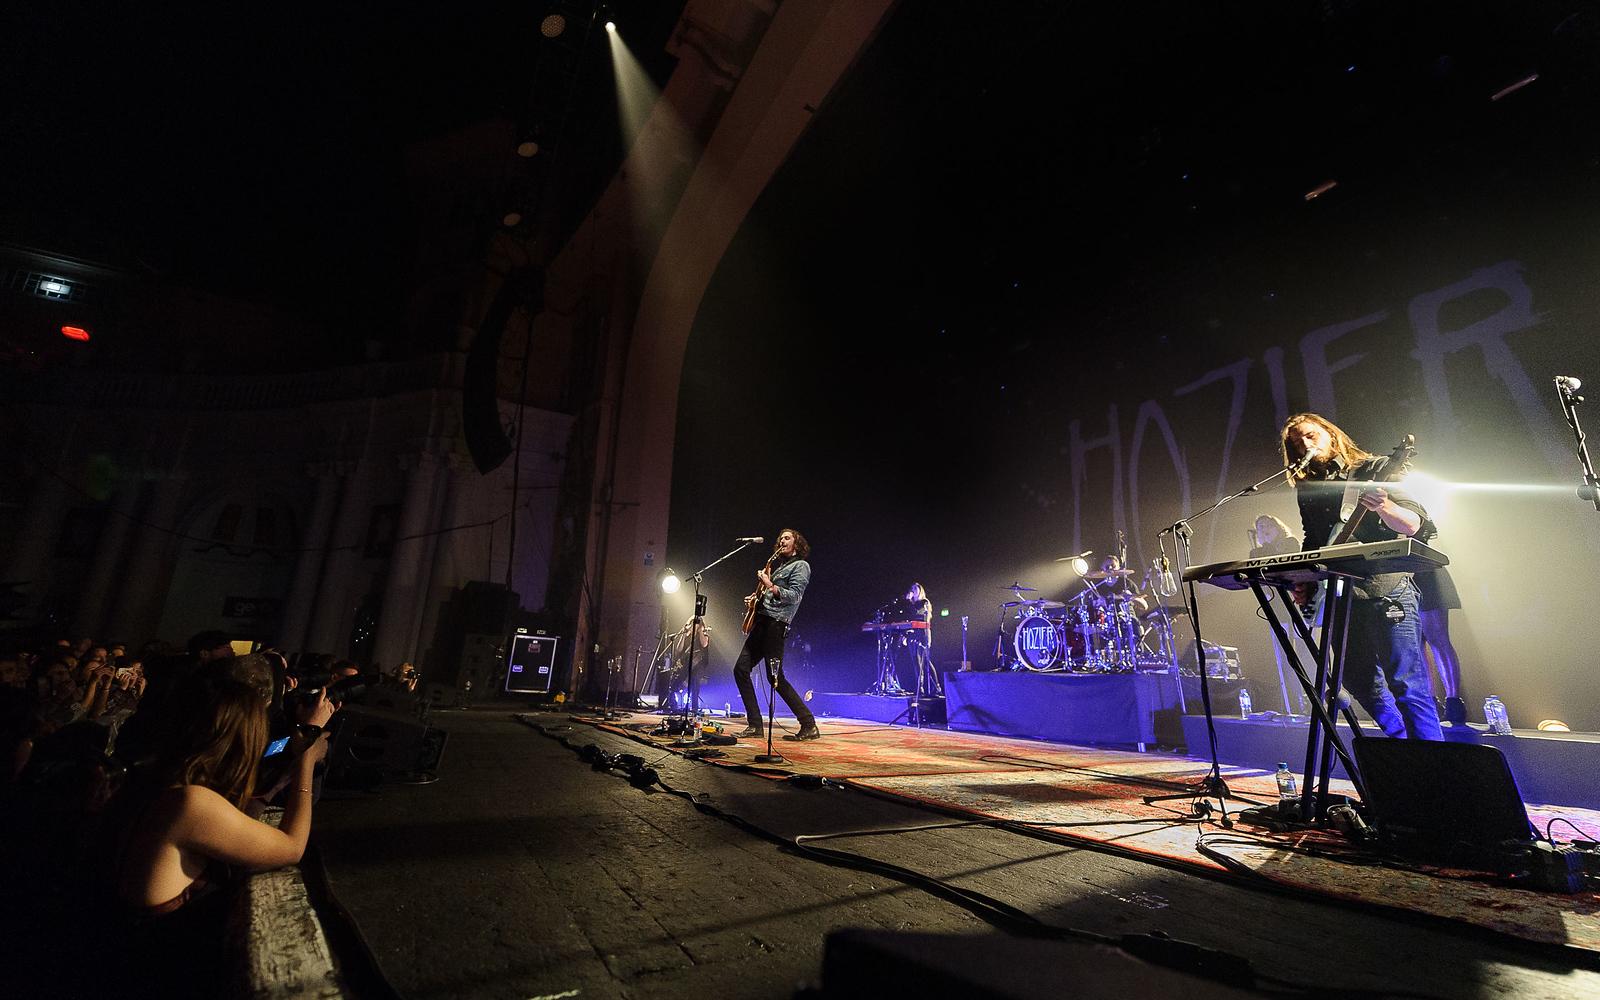 Hozier @ O2 Academy Brixton 29/01/16